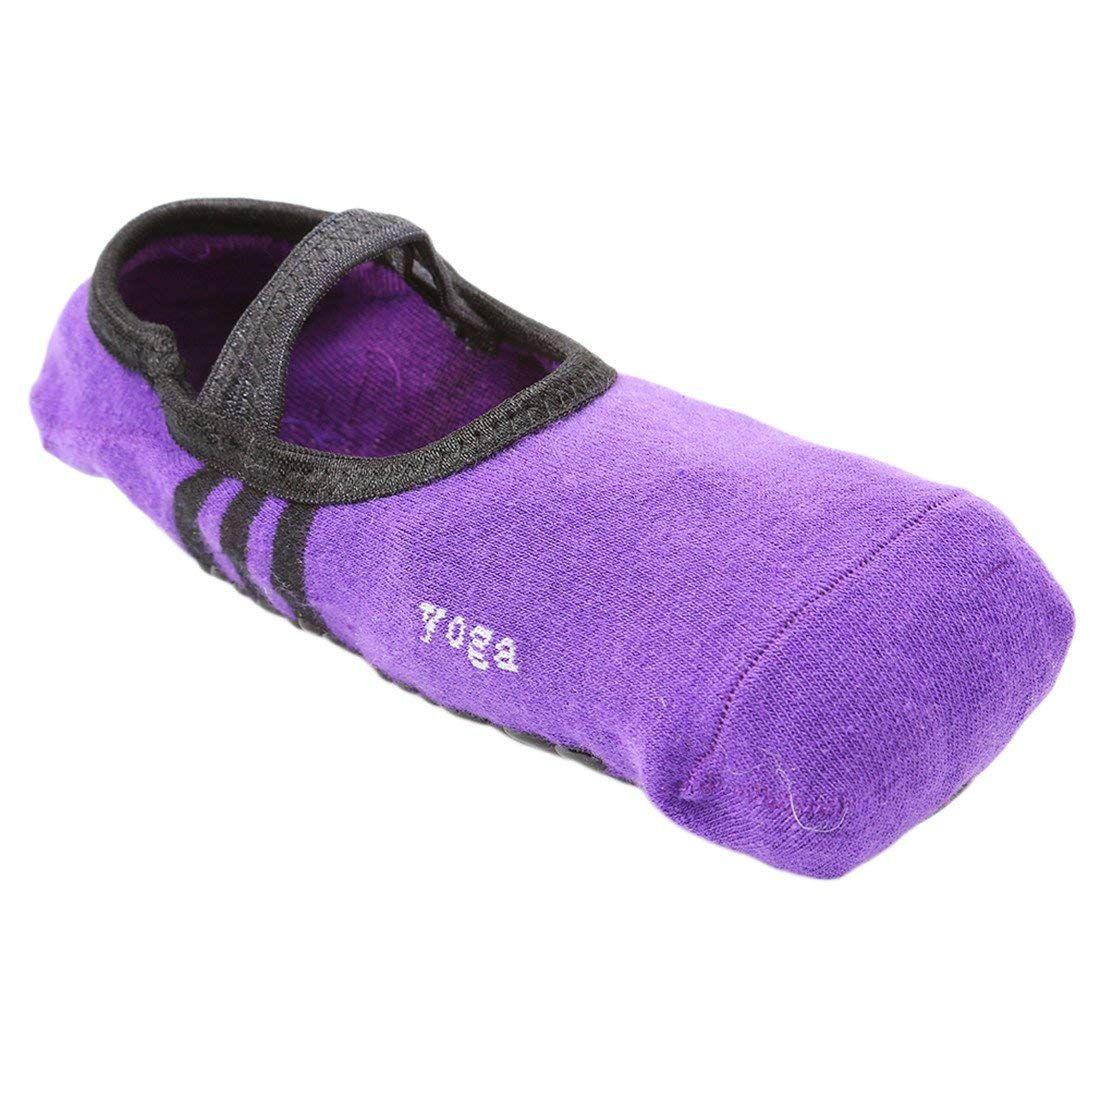 Sports Yoga Socks Slipper Anti Slip Massage Ballet Pilates Socks Professional UK